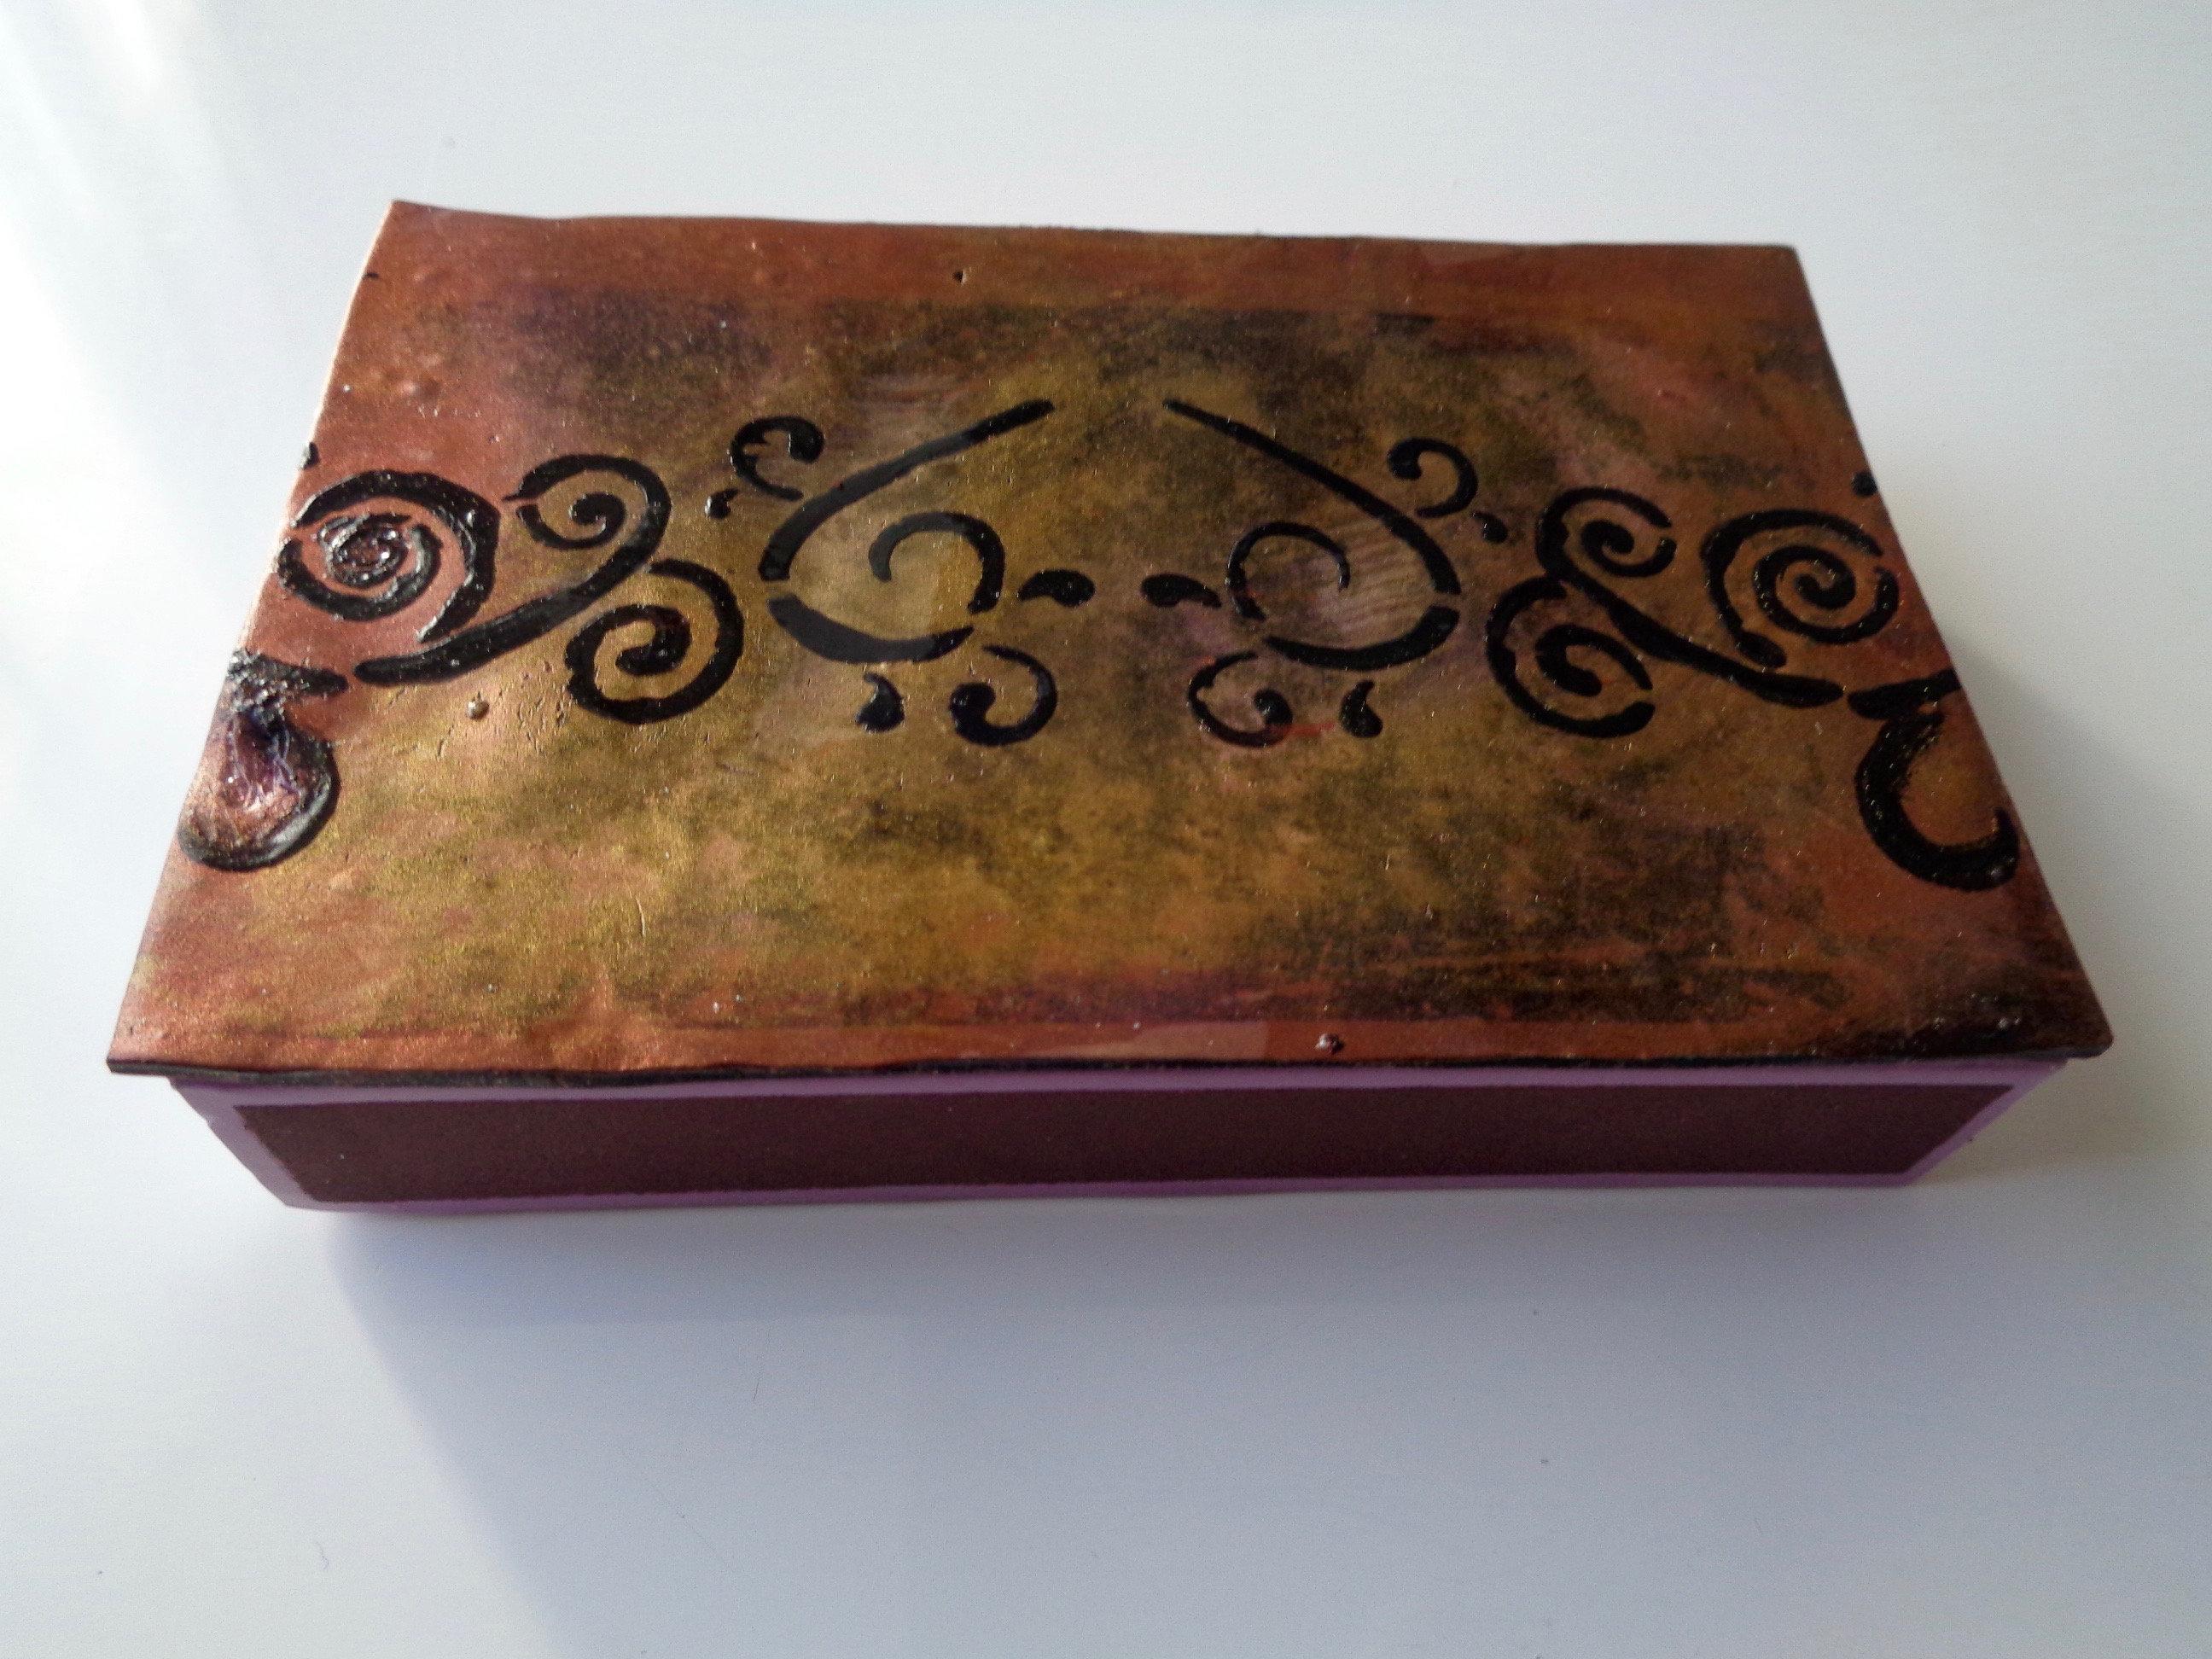 Mediumbronze matchbox